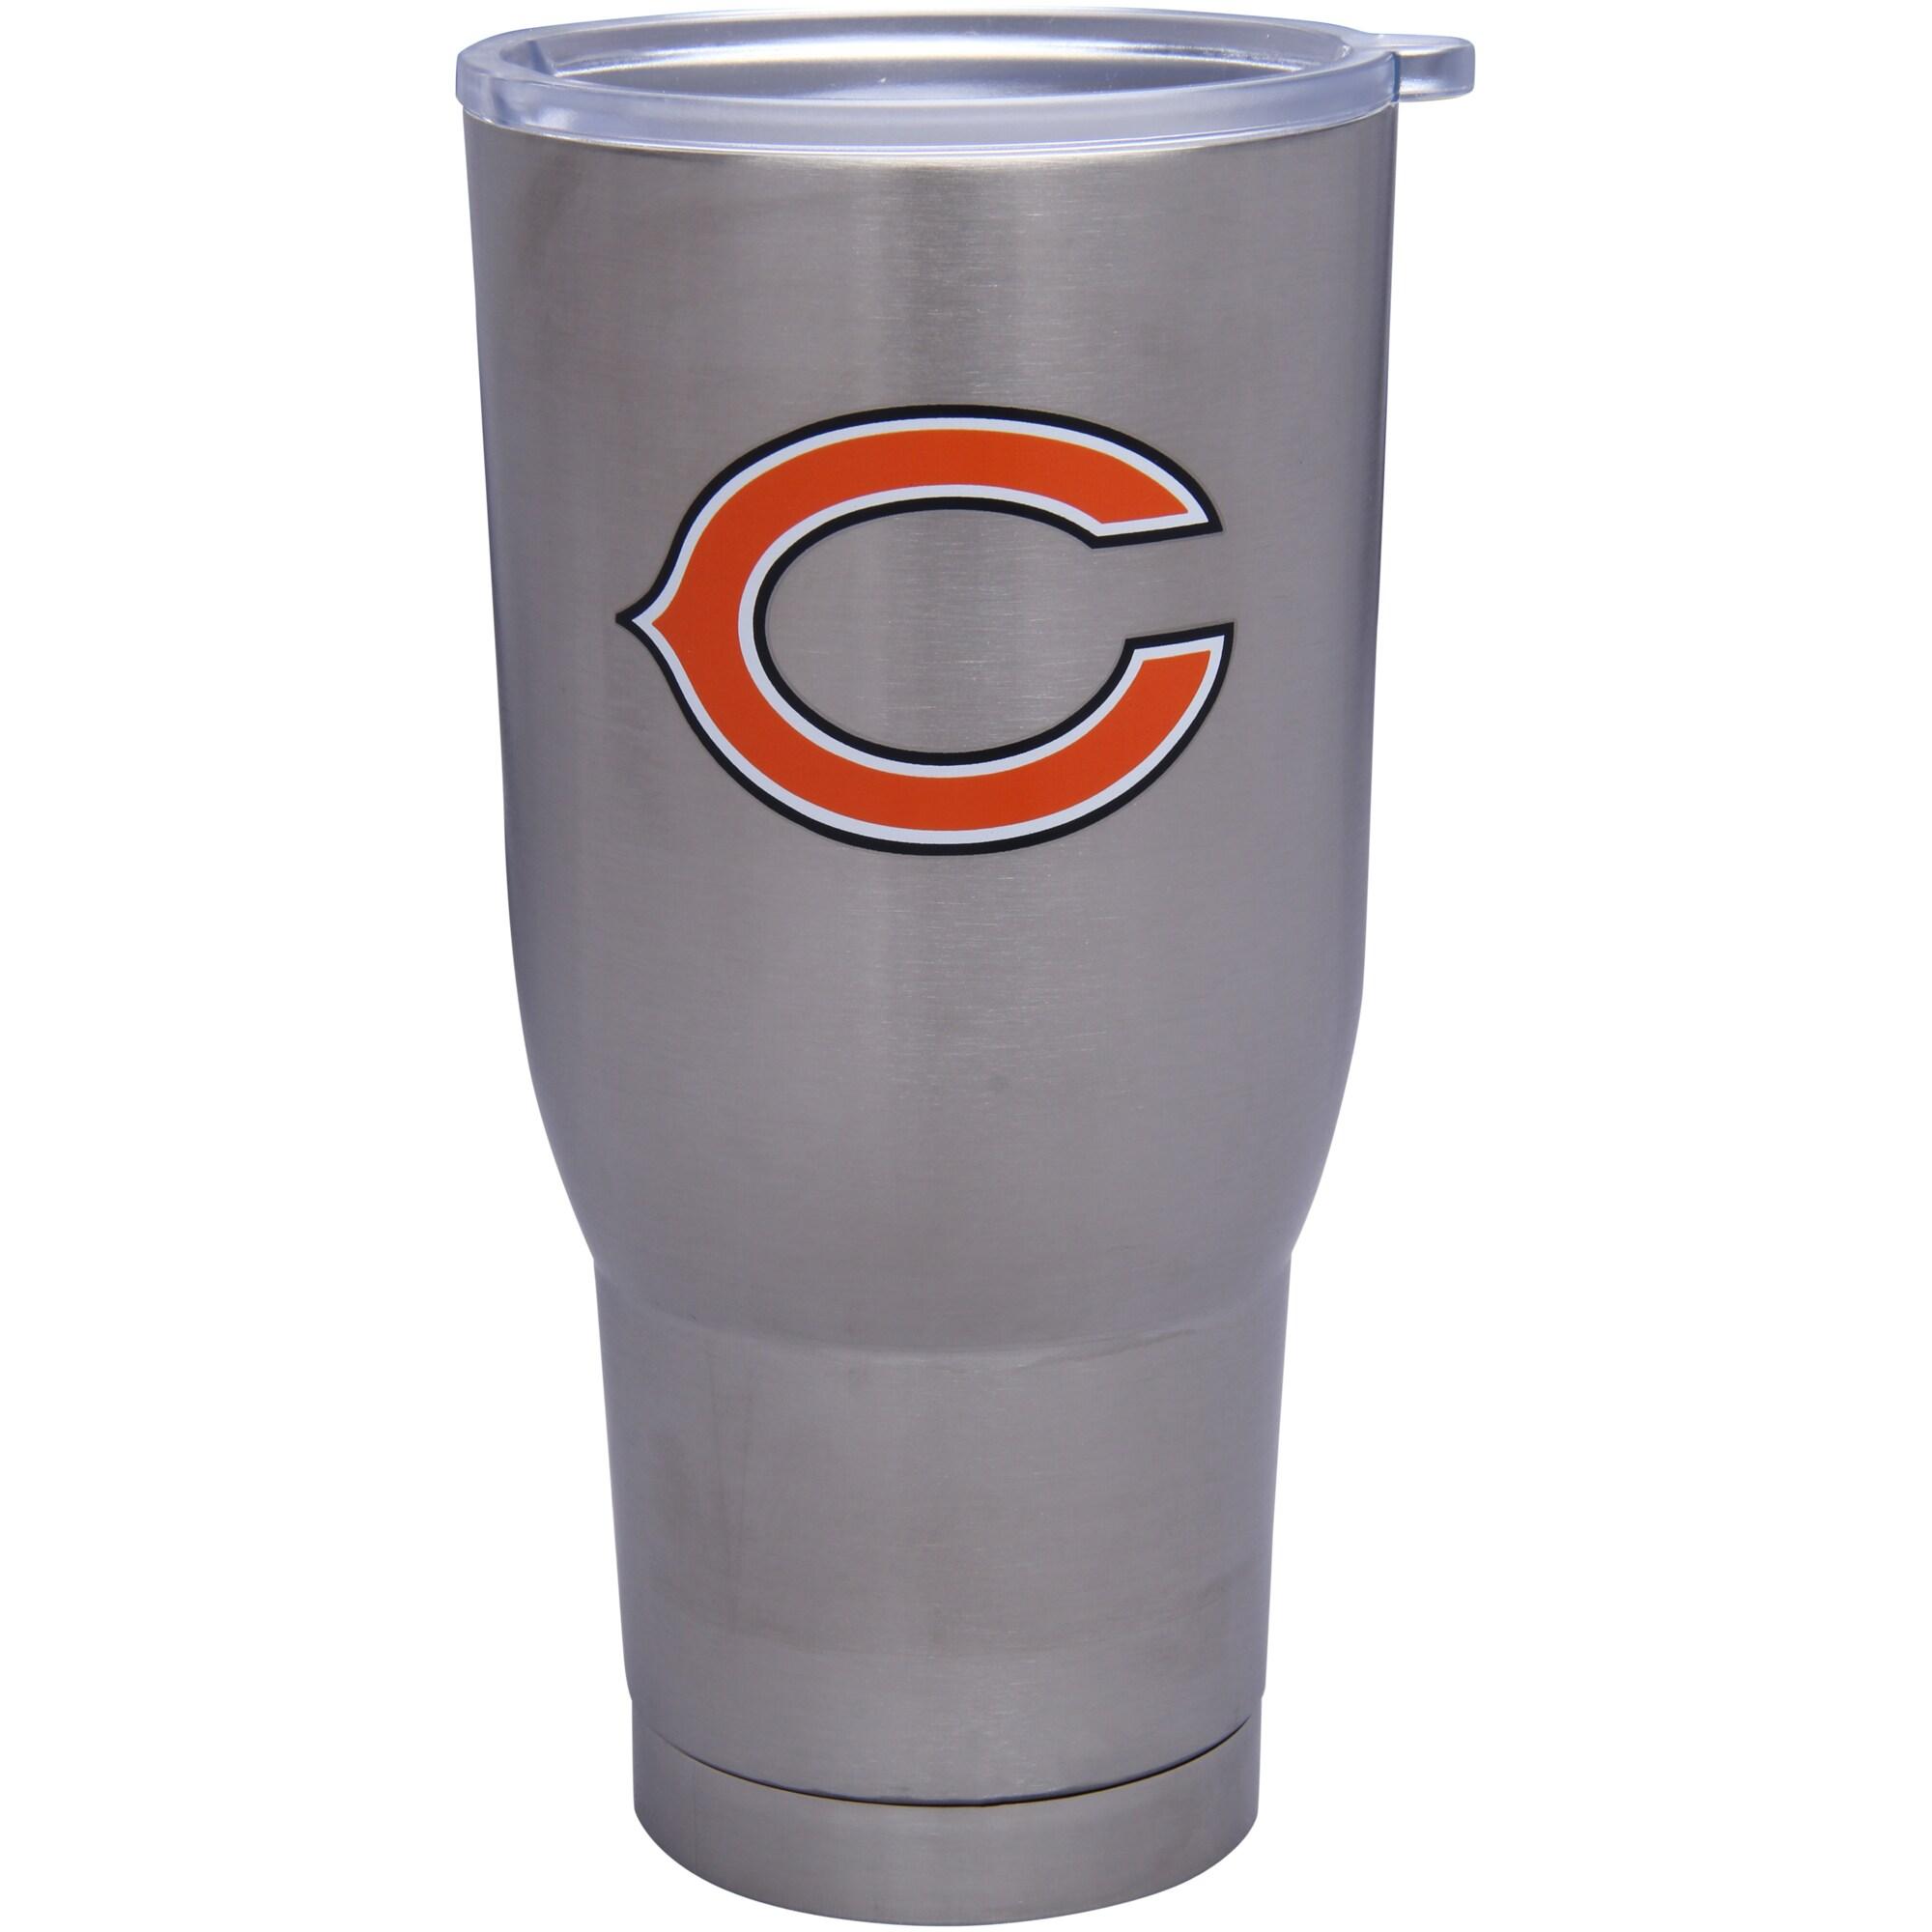 Chicago Bears 32oz. Stainless Steel Keeper Tumbler